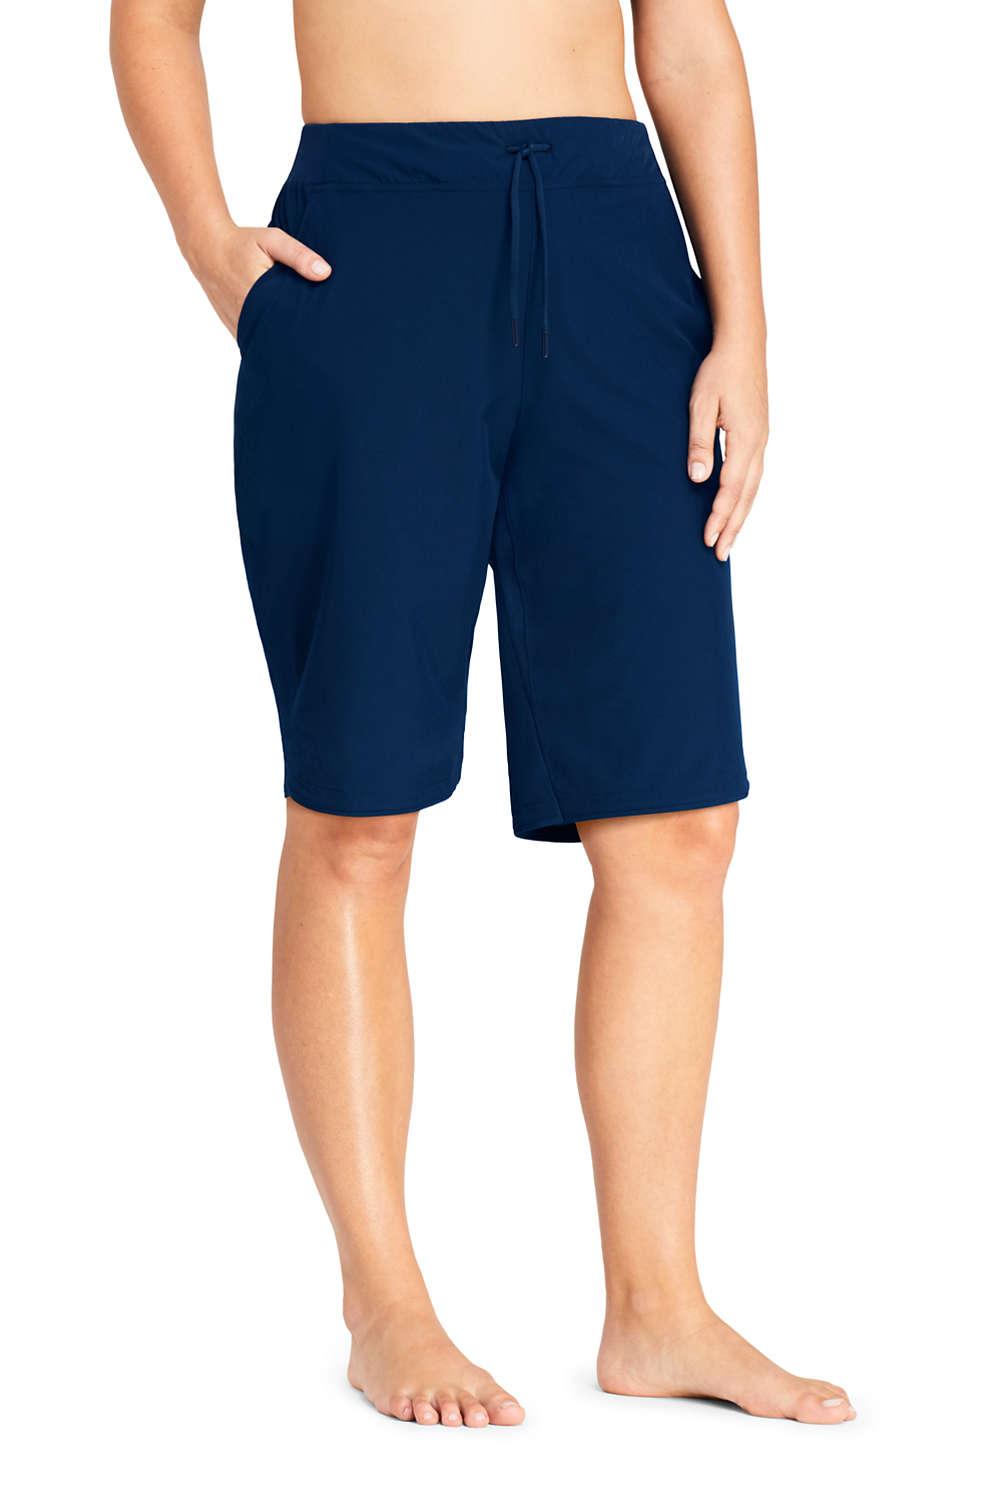 29e1f992bd8 Women's Plus Size Comfort Waist 11